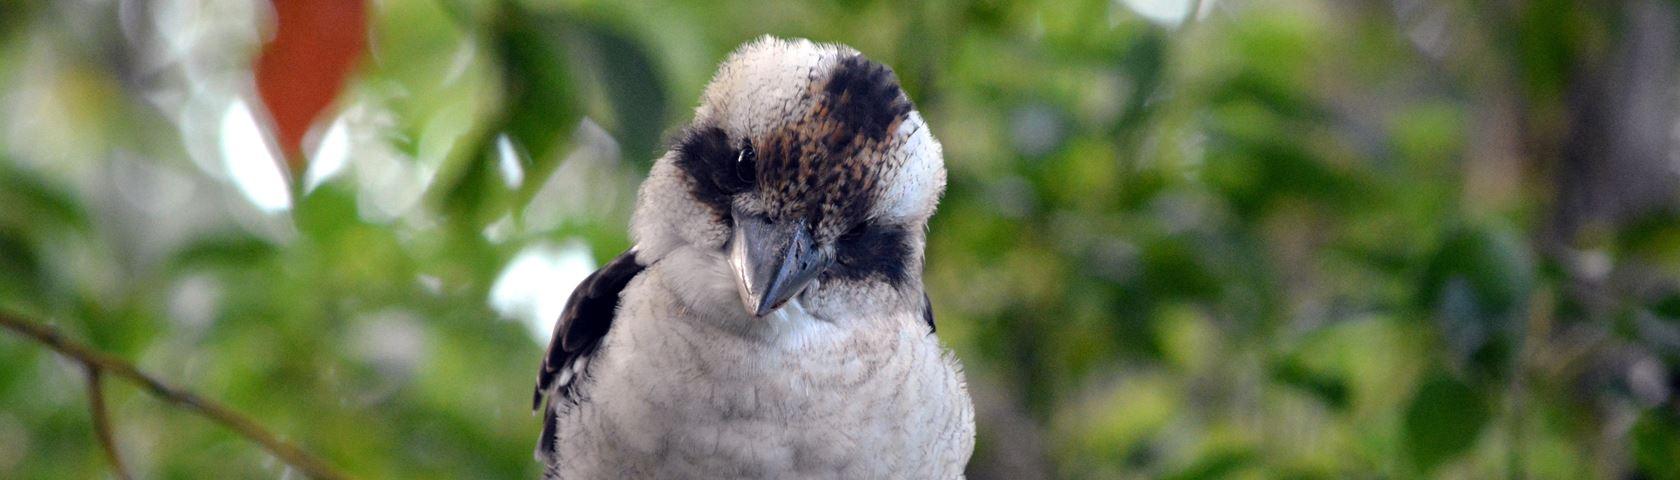 Pensive Kookaburra